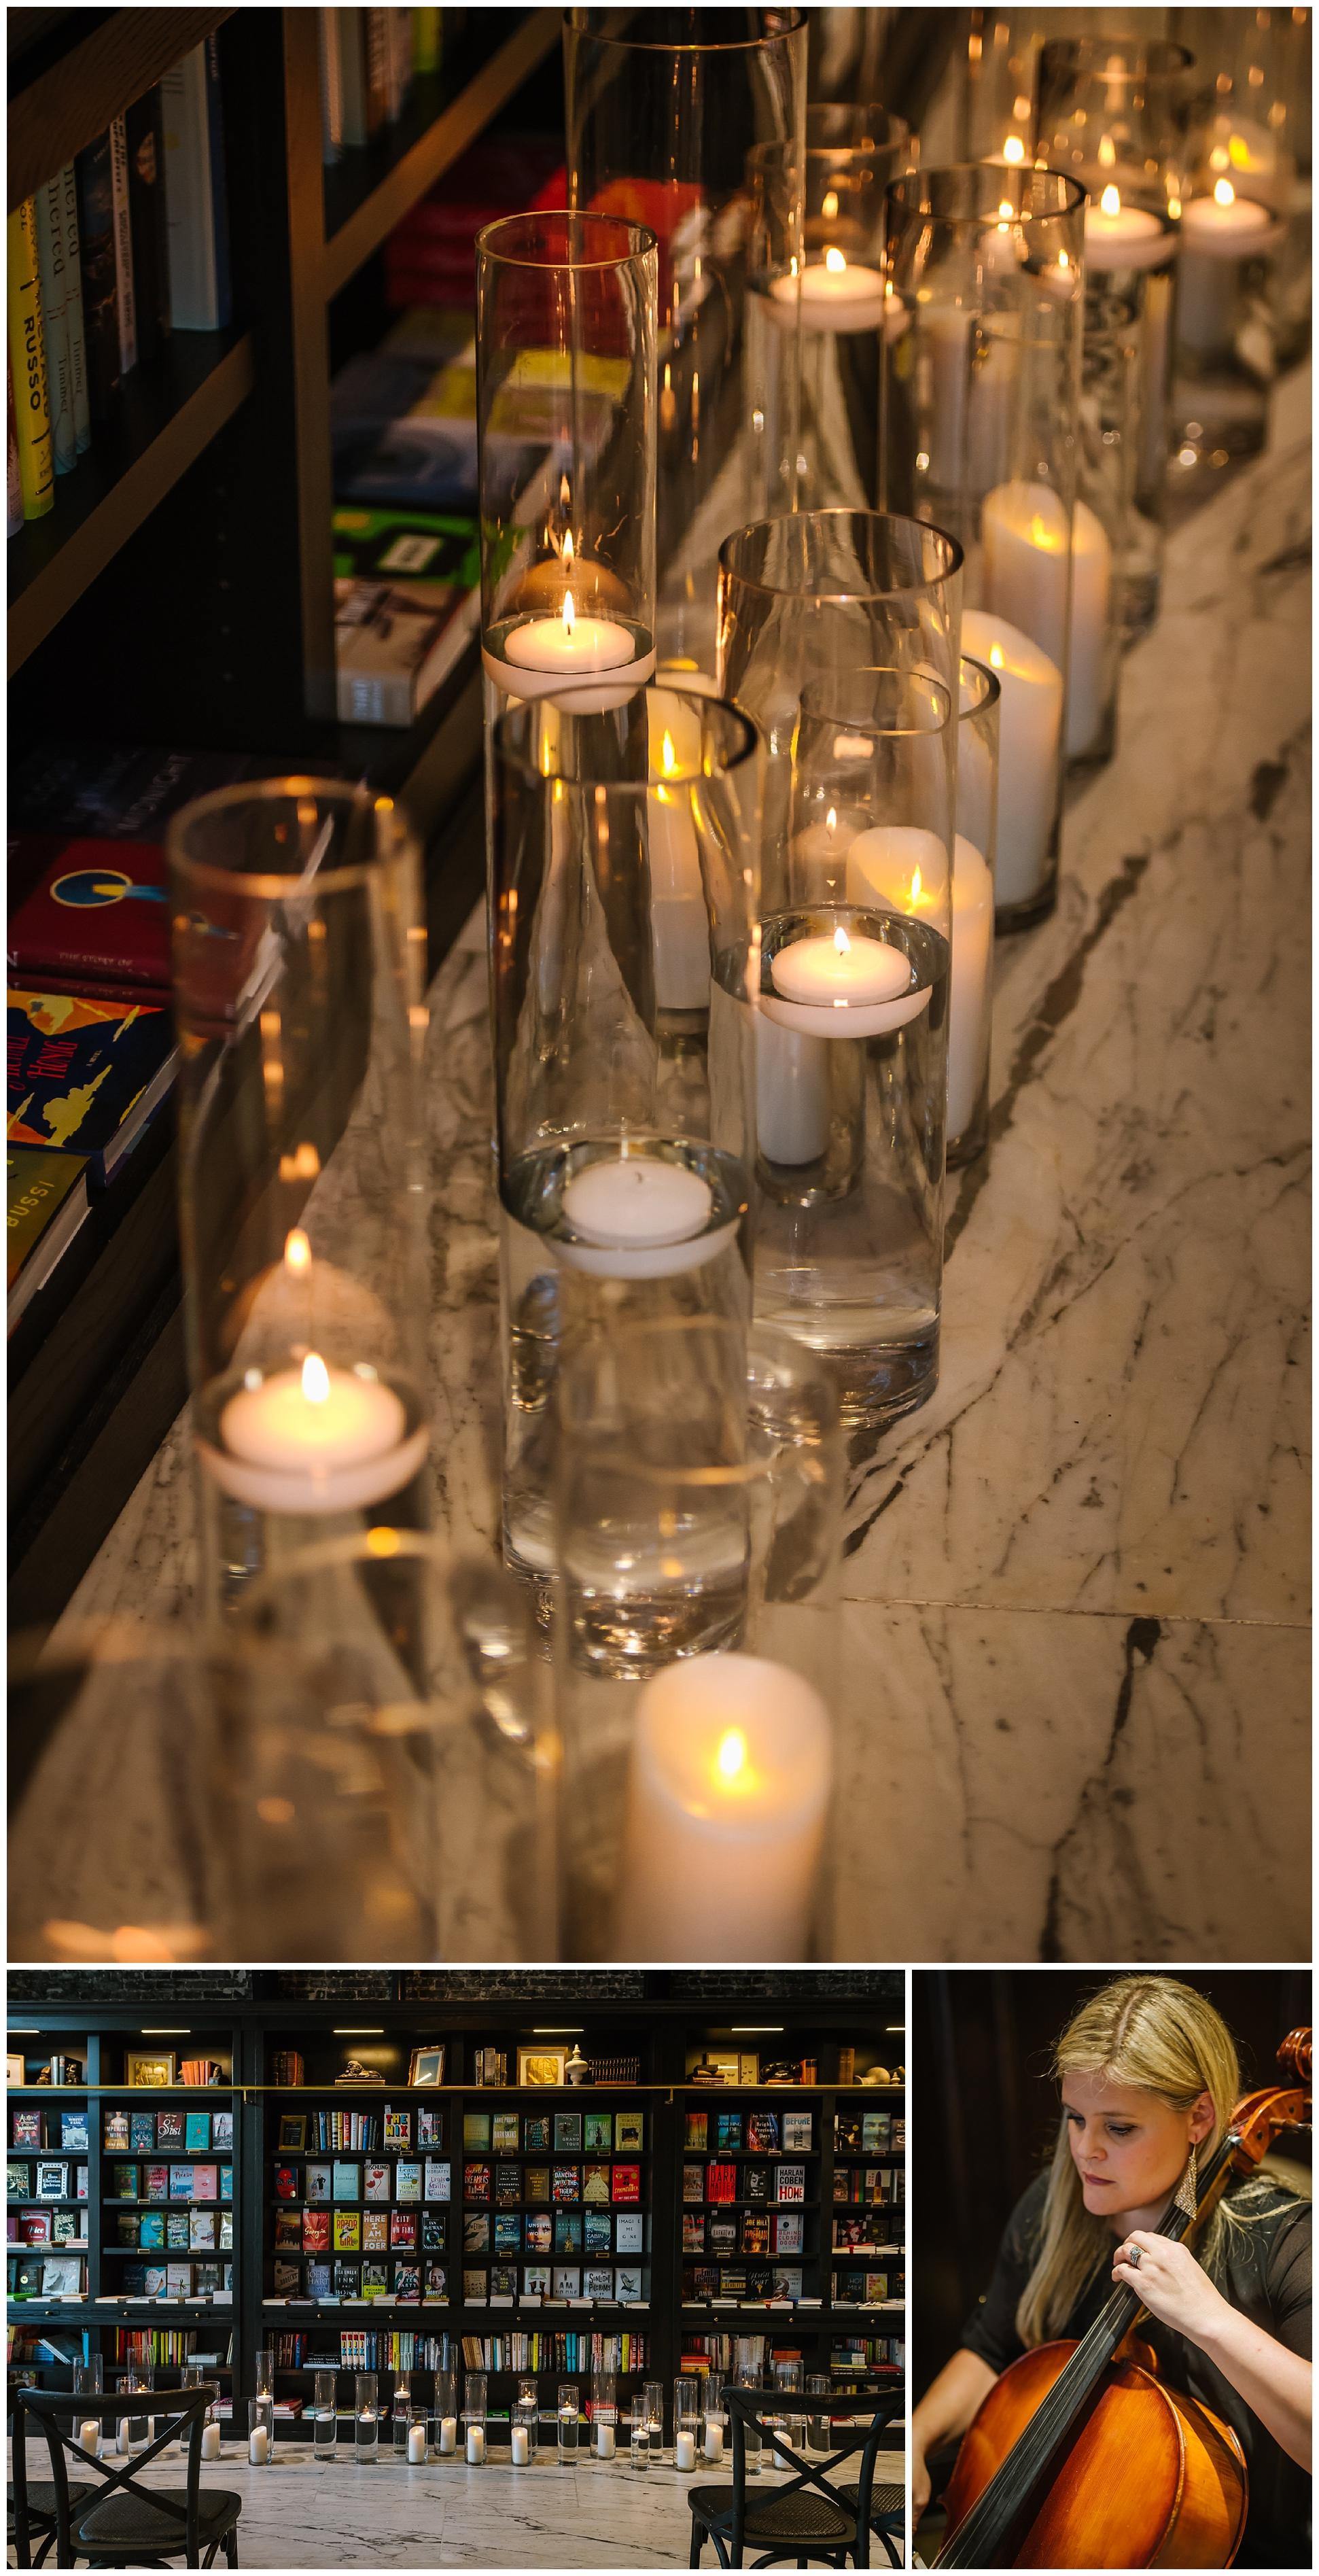 Oxford-exchange-wedding-photogapher-garland-candels-bookstore-burgandy-botanica_0036.jpg